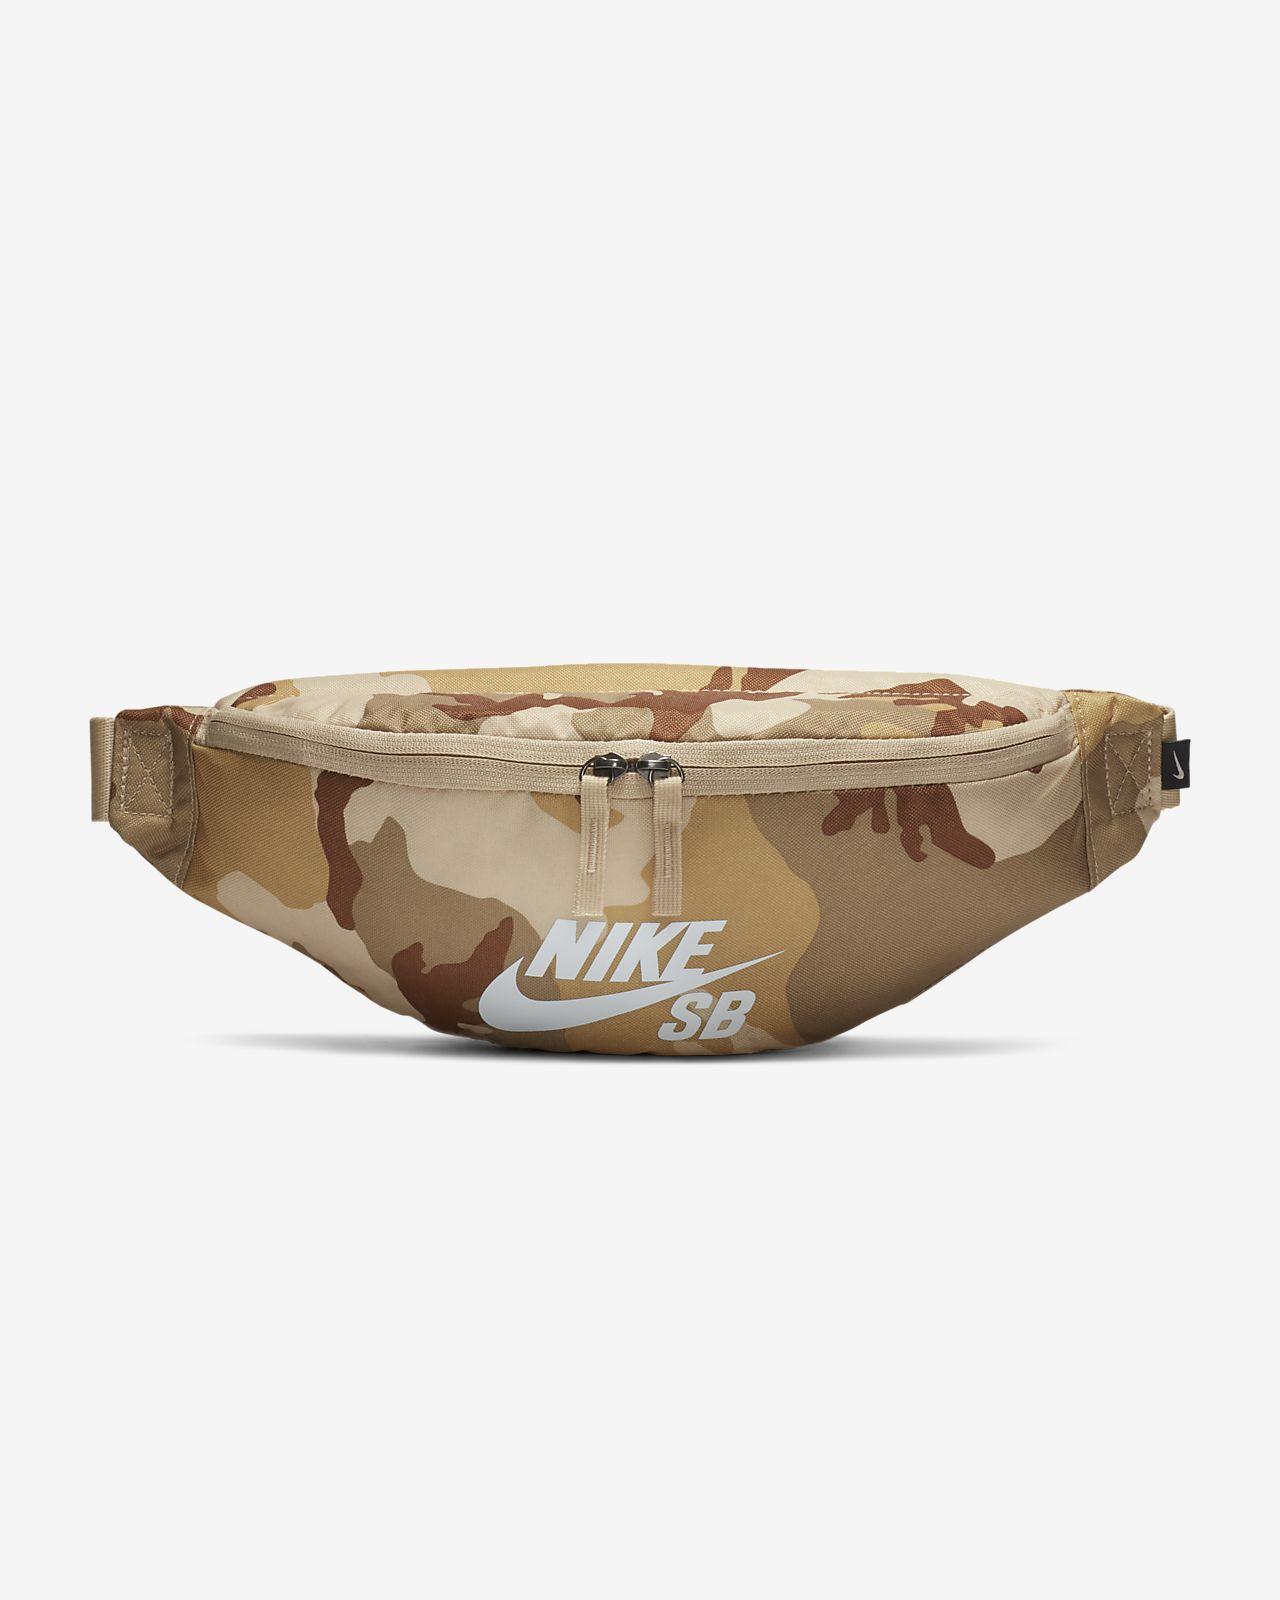 Nike SB Heritage Skateheuptas met print (kleine items)